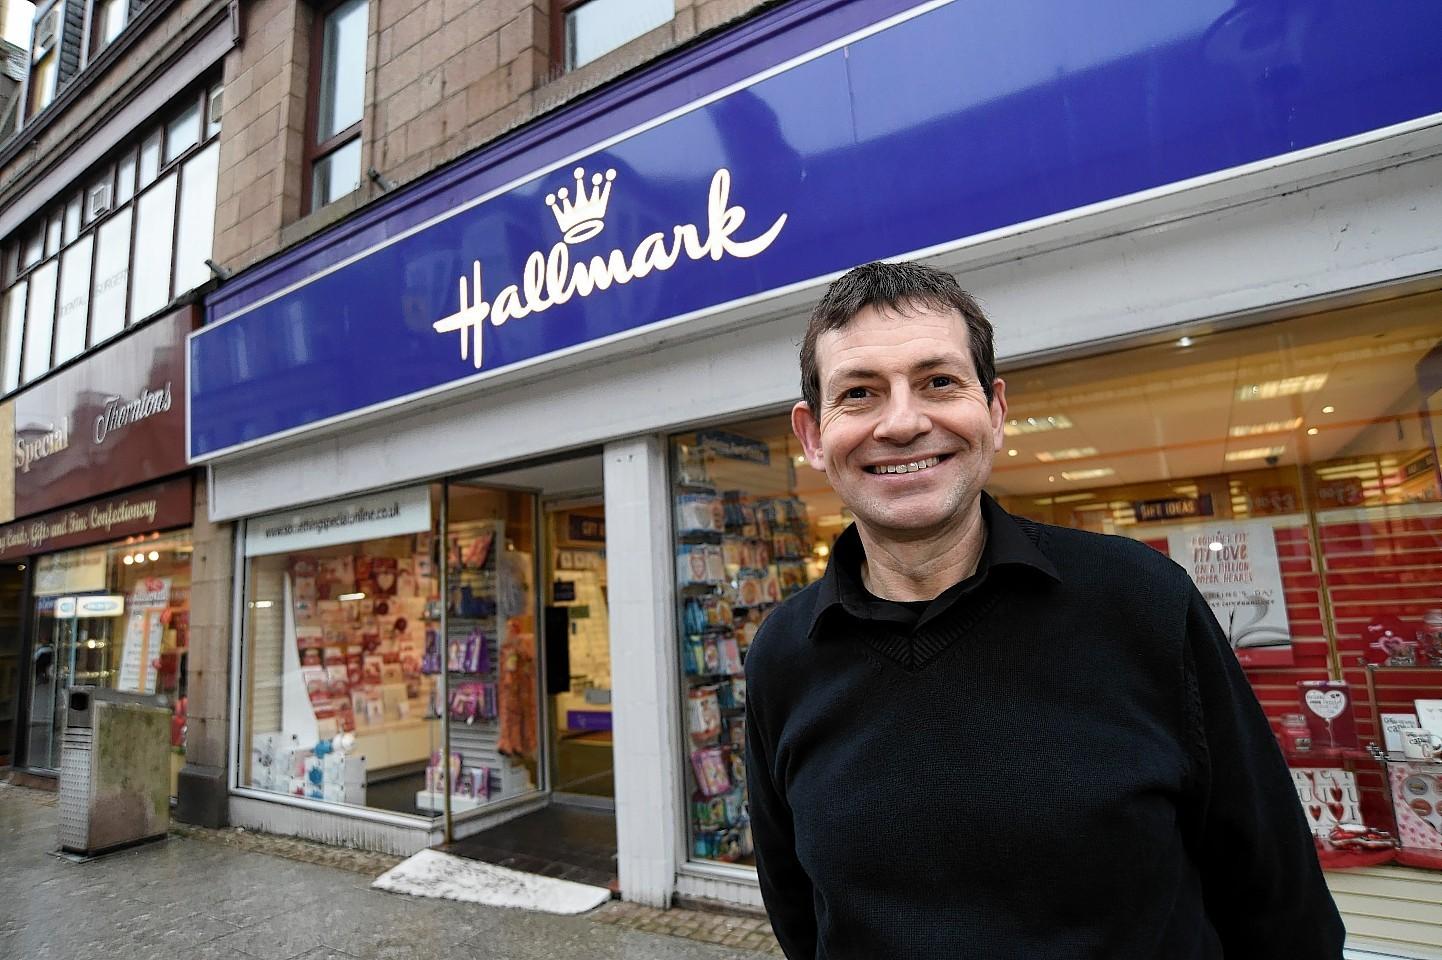 Ian Sutherland runs a Hallmark and Thorntons shop in Marischal Street